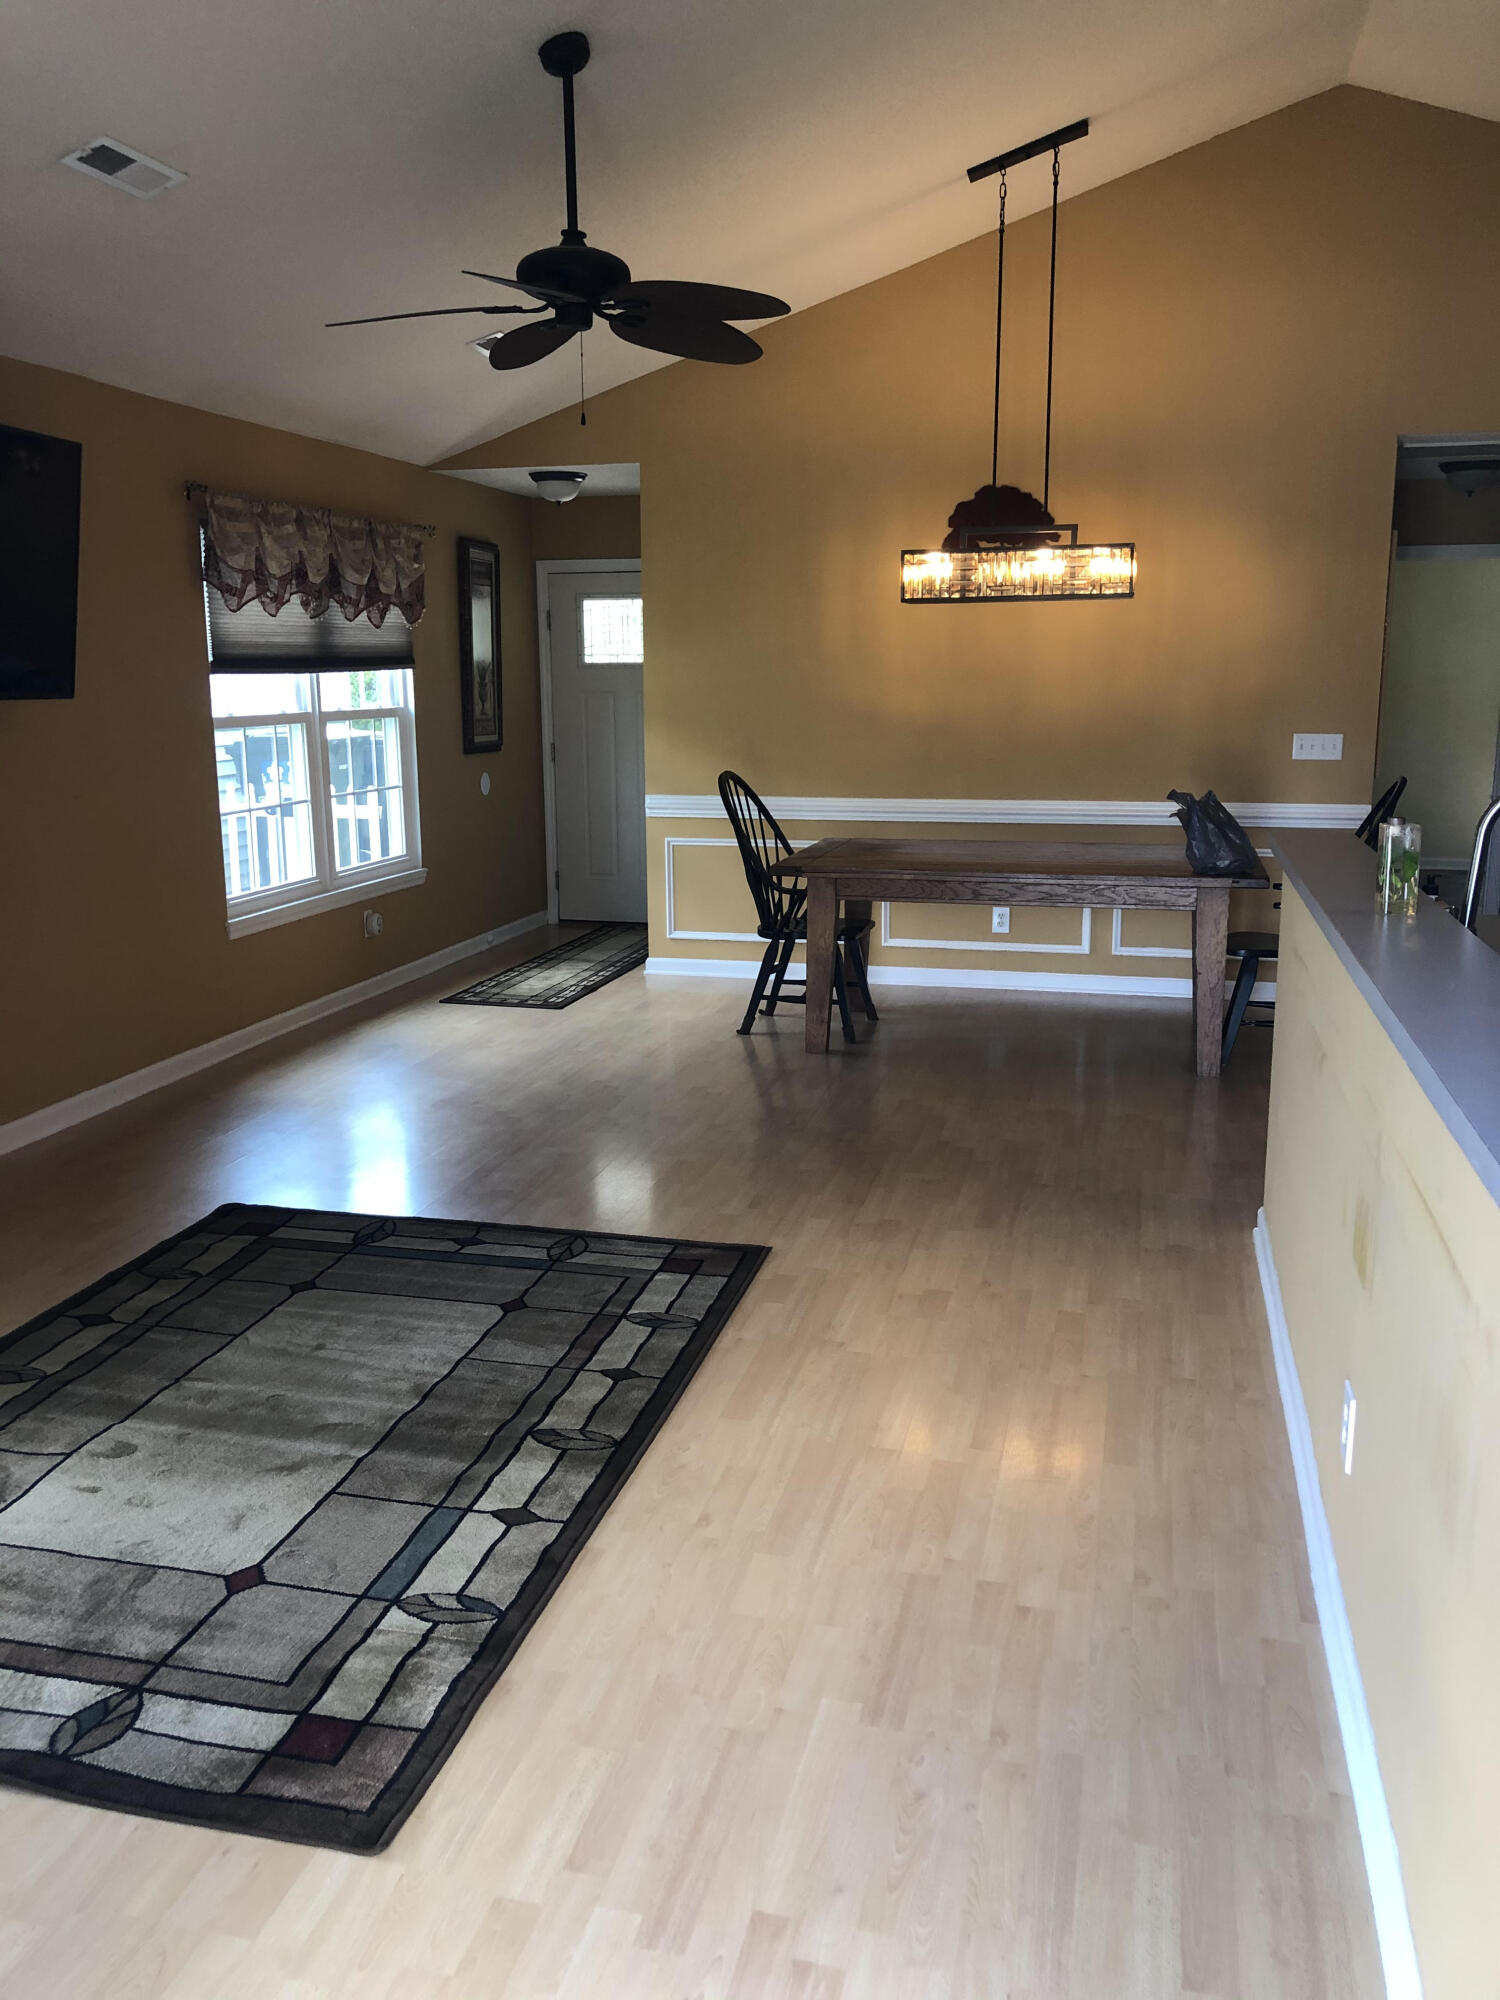 Sunburst Lakes Homes For Sale - 141 Jupiter, Summerville, SC - 4